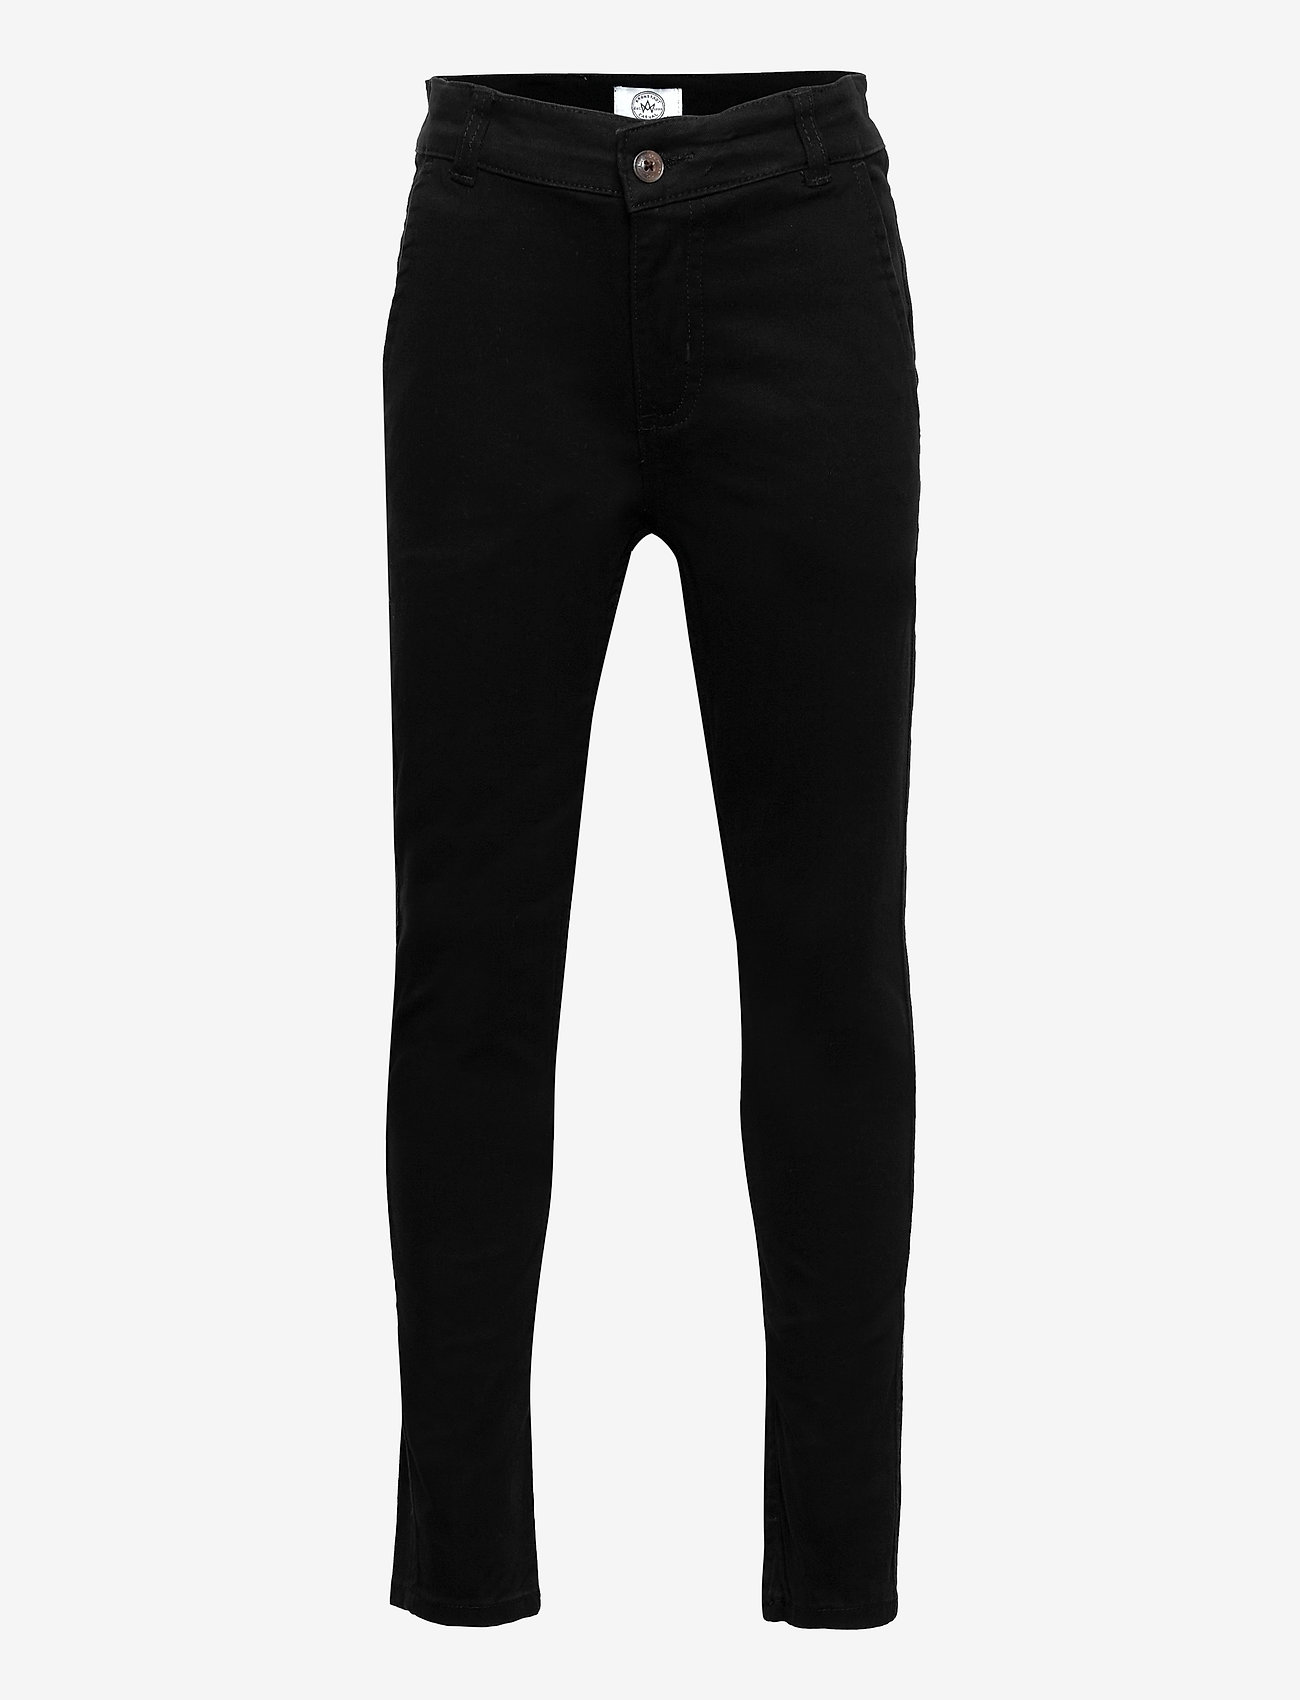 Kronstadt - Daniel Chino - trousers - black - 0